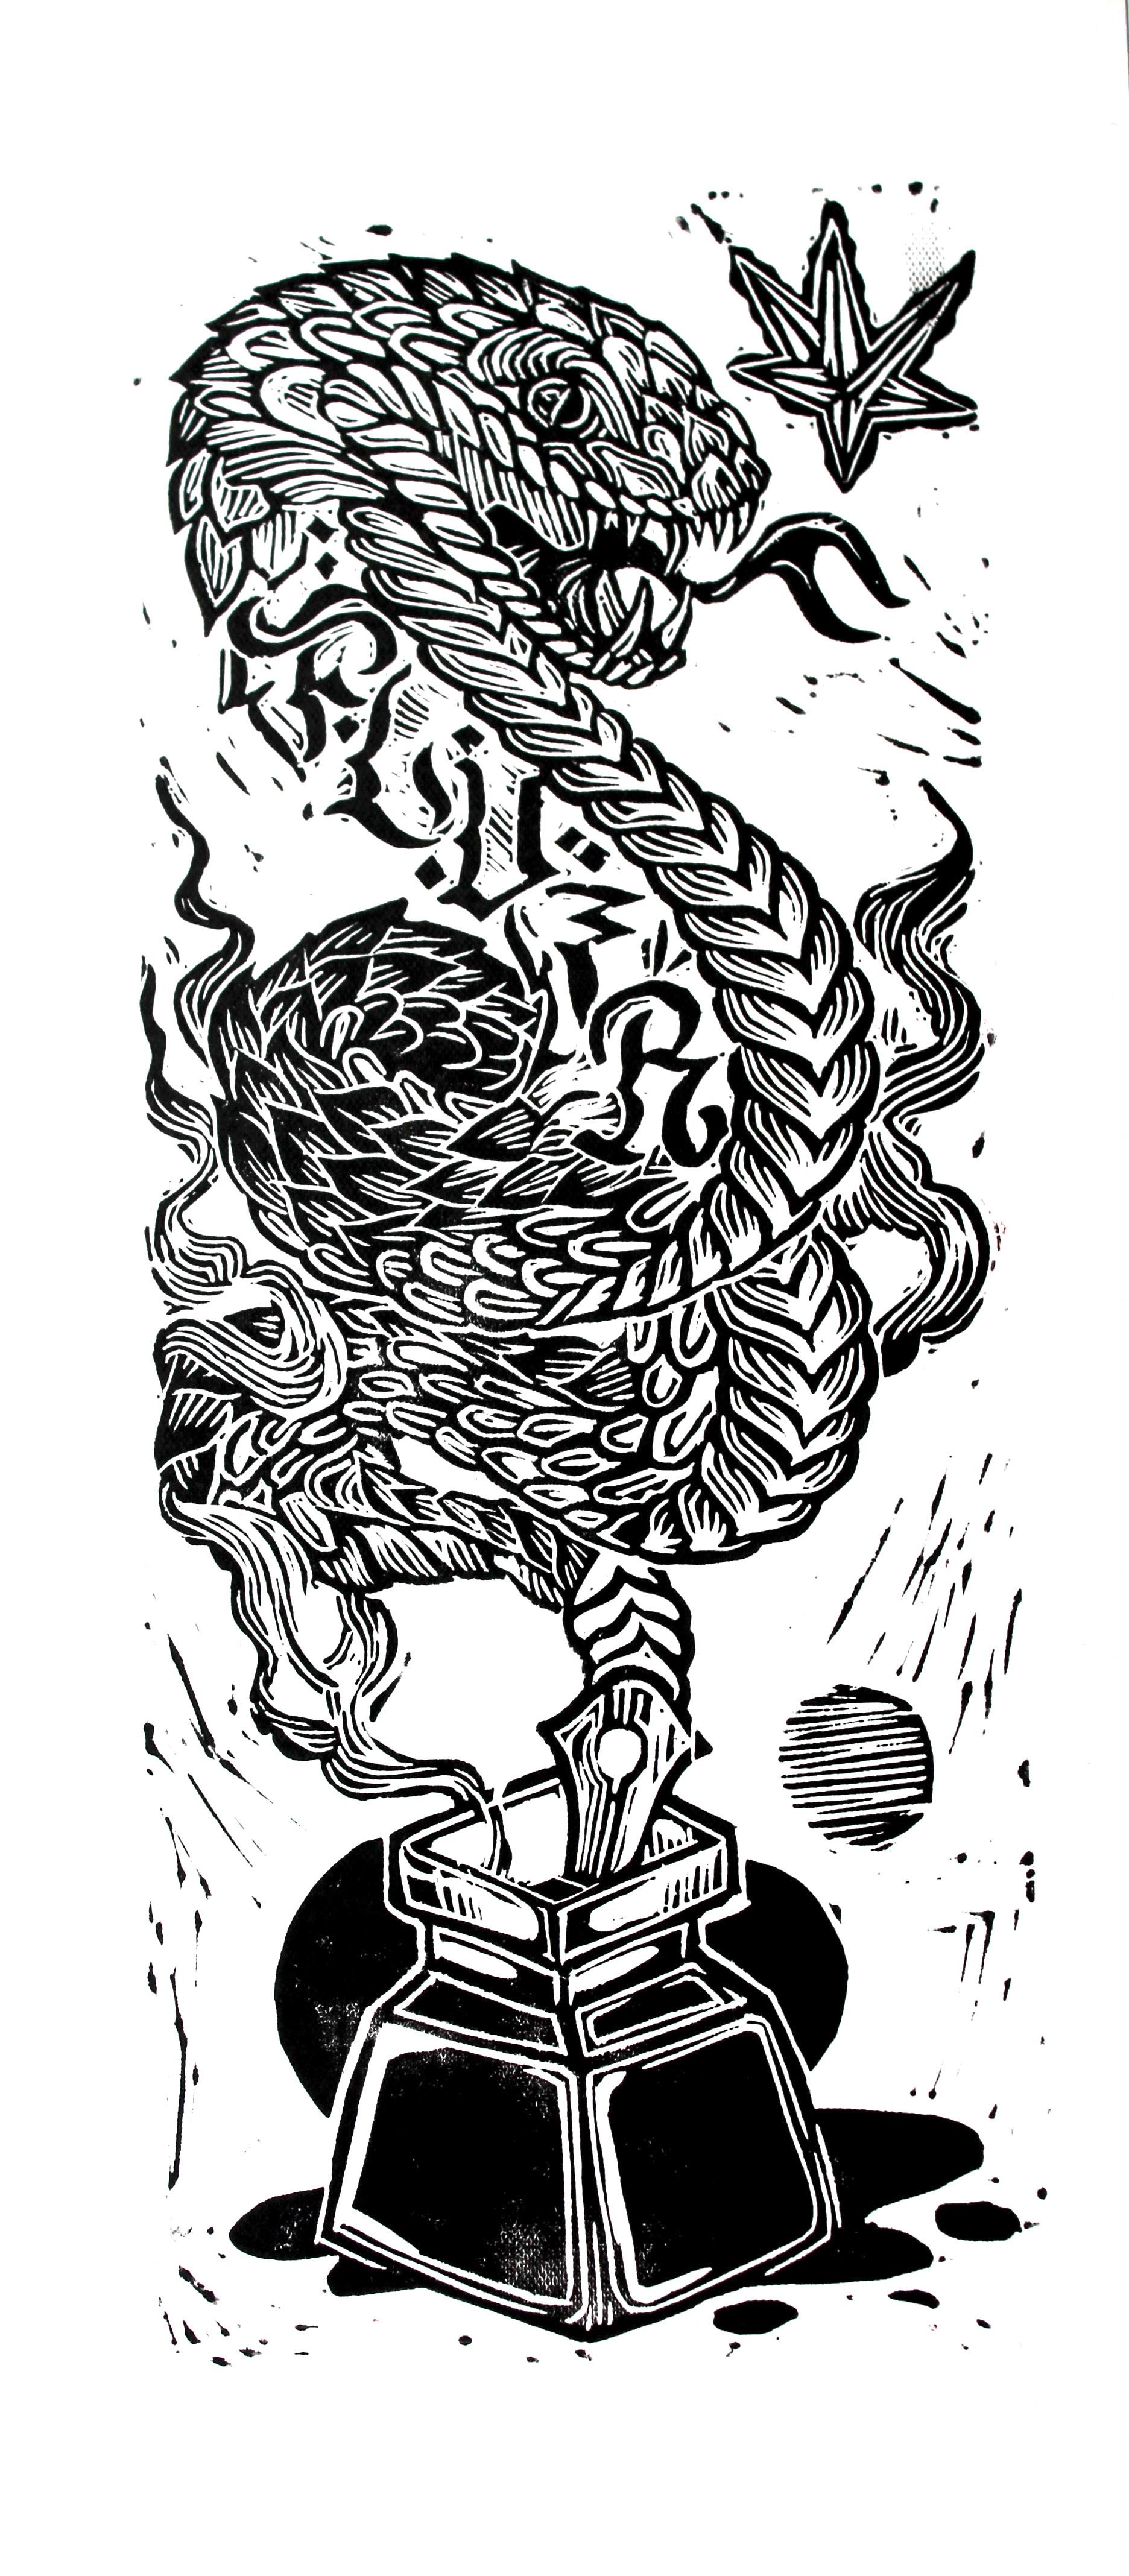 Culebreo (2018) - 50 x 18 cm - Grabado en linóleo P/A / Linoleum etchin